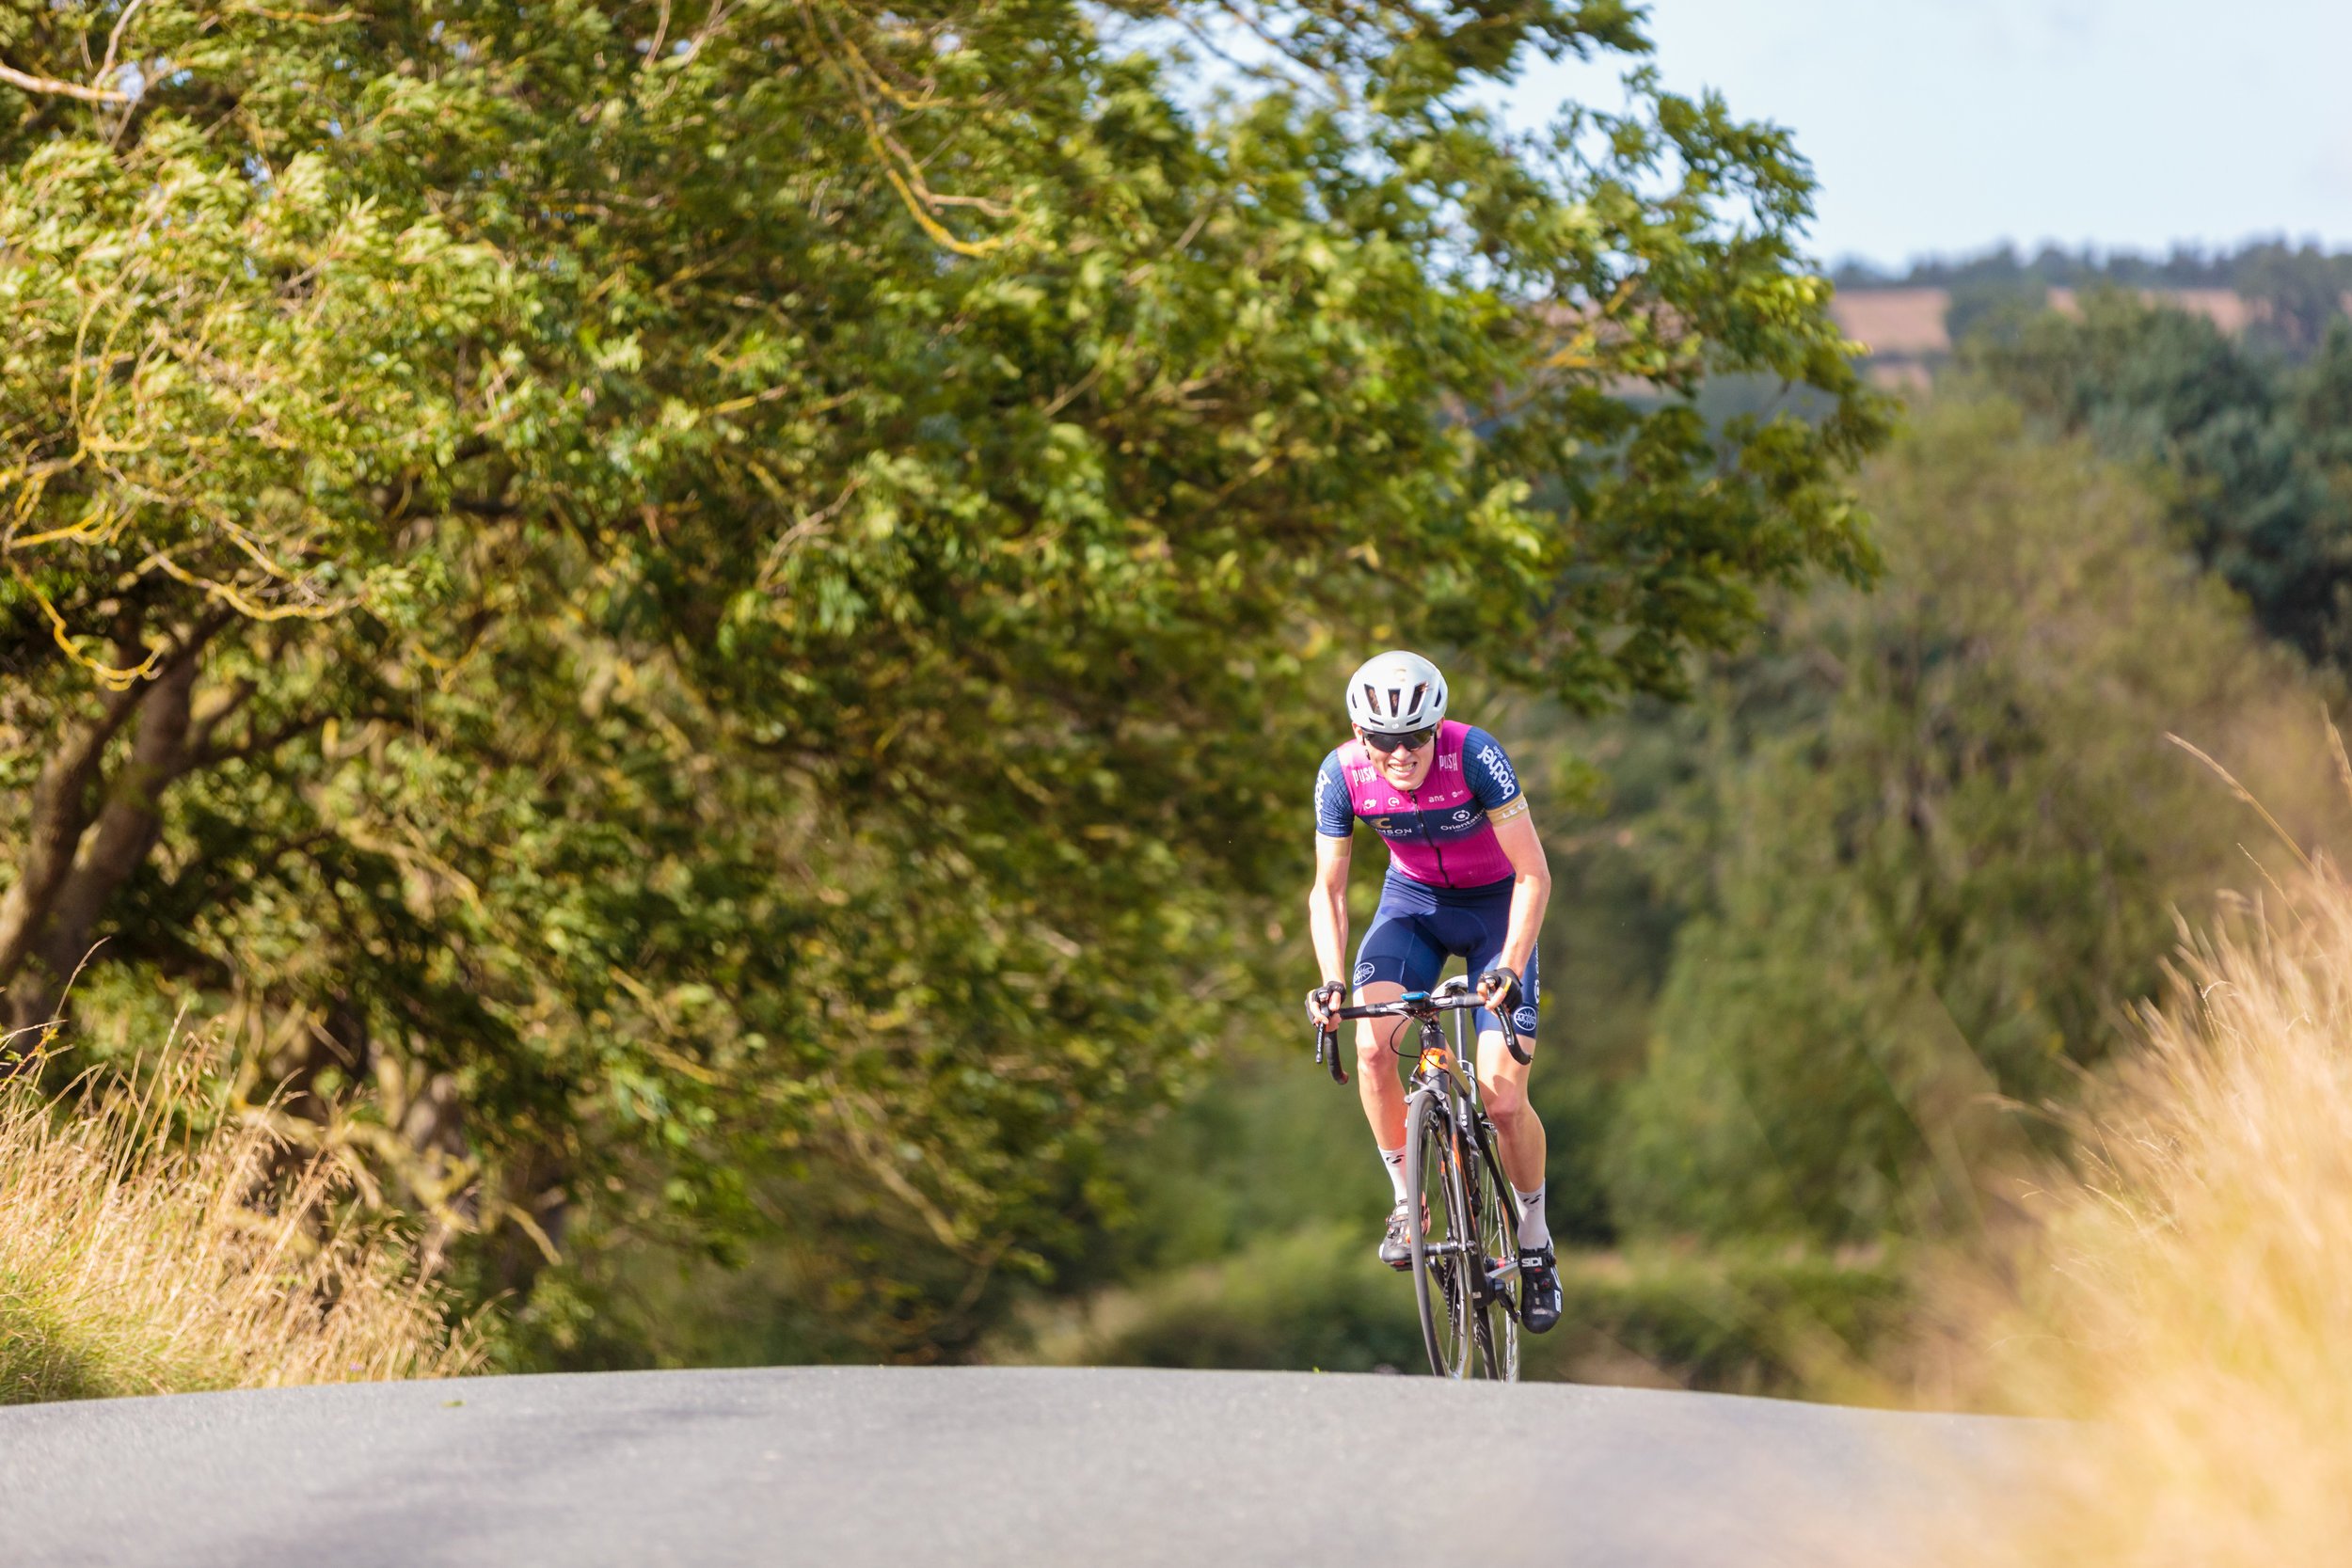 Crimson Performance Rider Crests a Climb